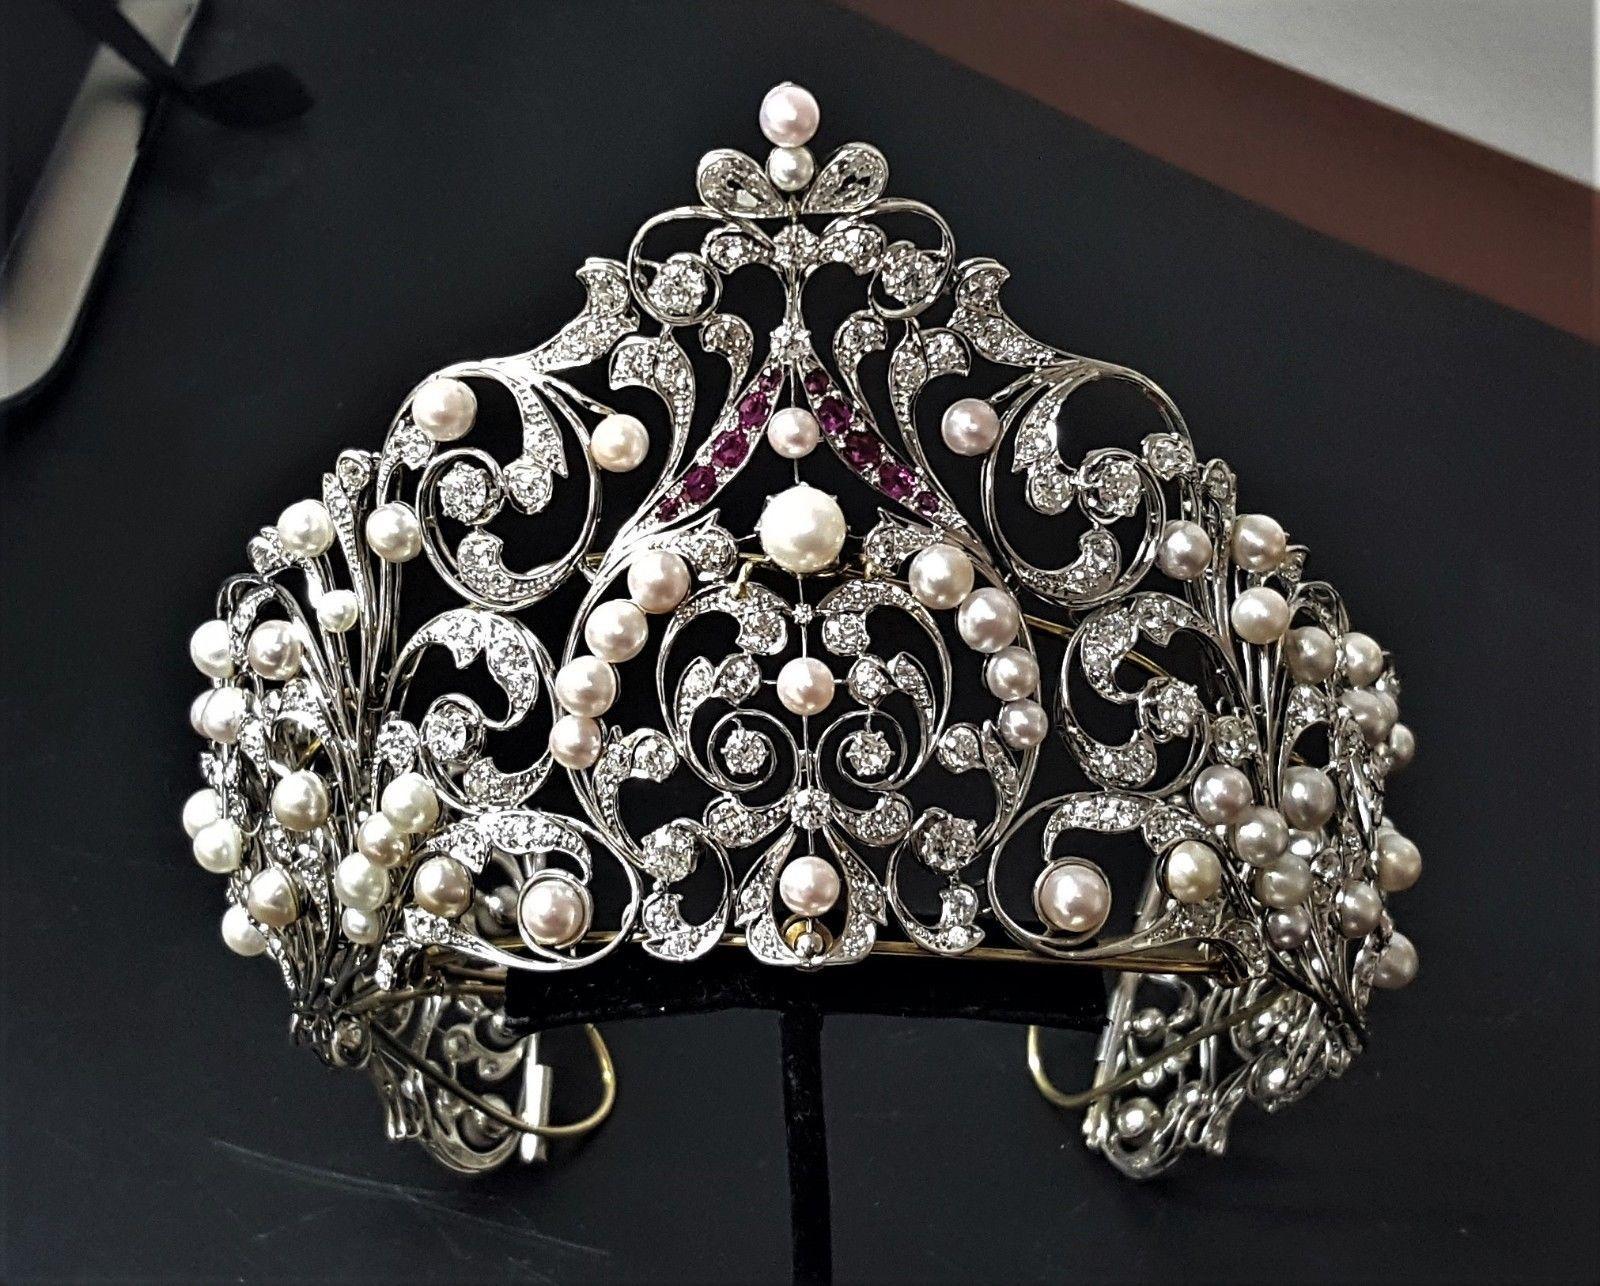 8.70ct Natural Round Diamond Ruby 14k Solid White Gold Wedding Anniversary Tiara Bridal & Wedding Party Jewelry Jewelry & Watches